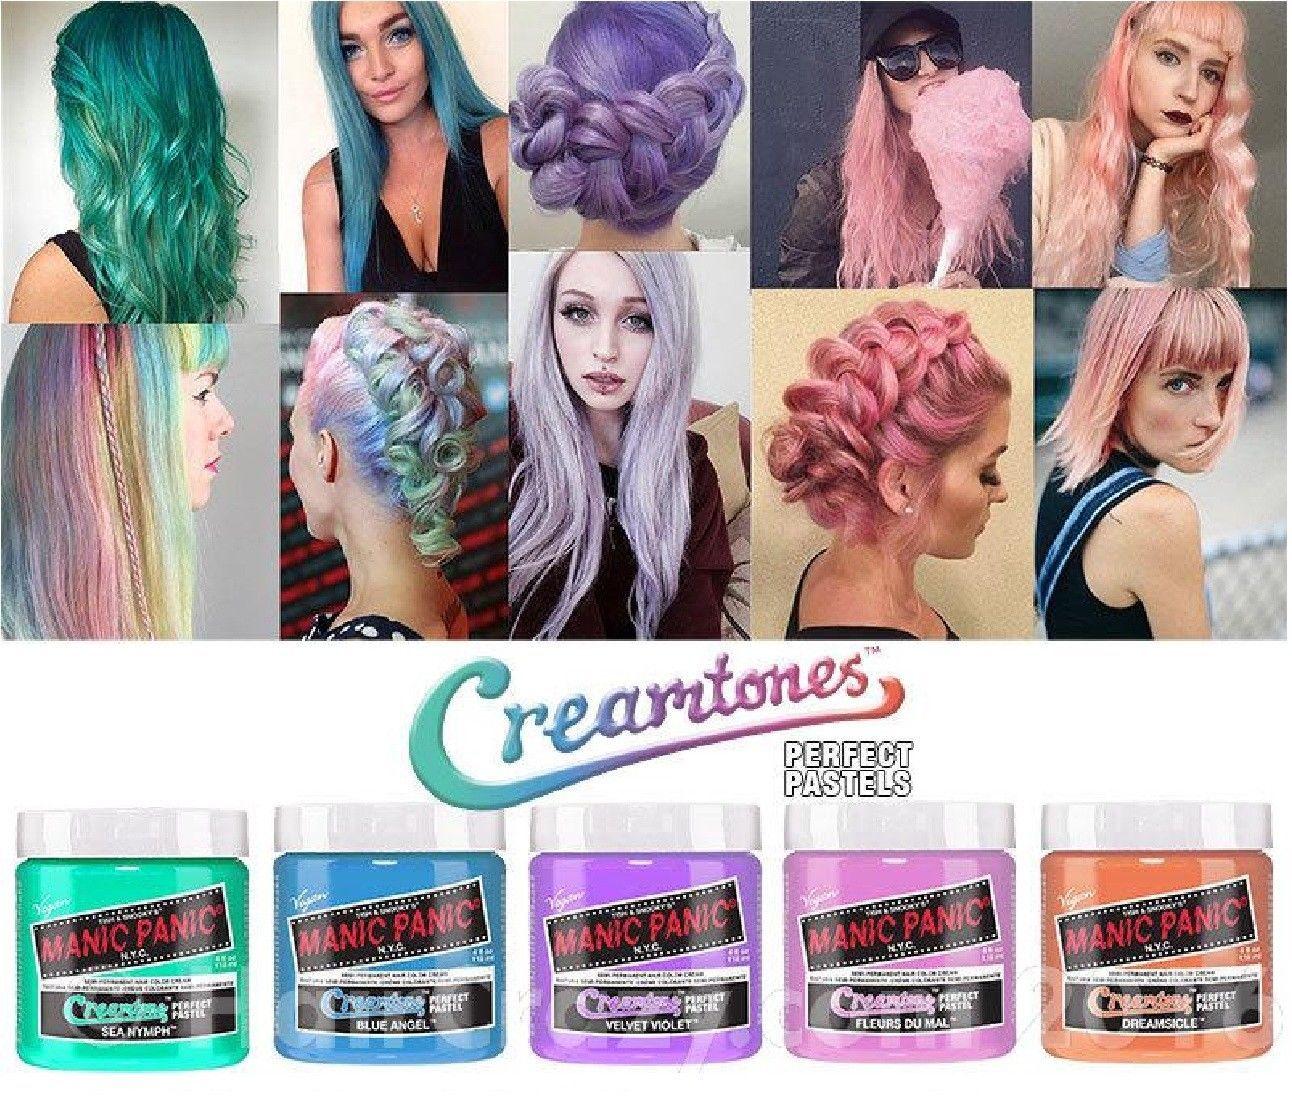 Manic Panic Creamtone Perfect Pastel Semi Permanent Hair Color 118ml Manic Panic Hair Color Manic Panic Hair Hair Color